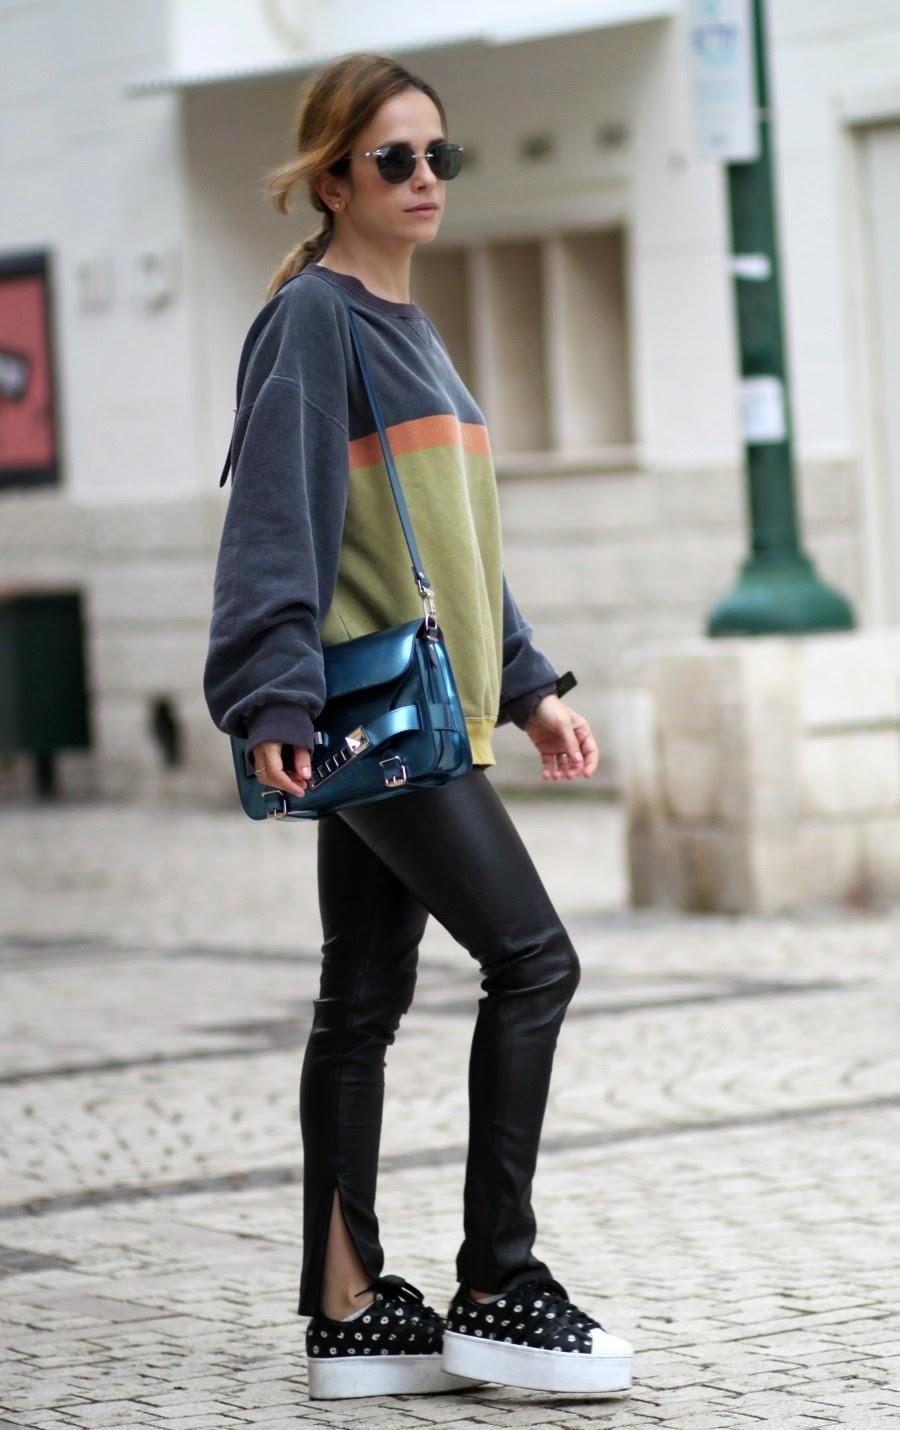 ps11, proenzaschouler, calvinklein, clueless, streetstyle, puffsleevess, sweatshirt, streetstyle, fashioblog, אופנה, בלוגאופנה, סטייל